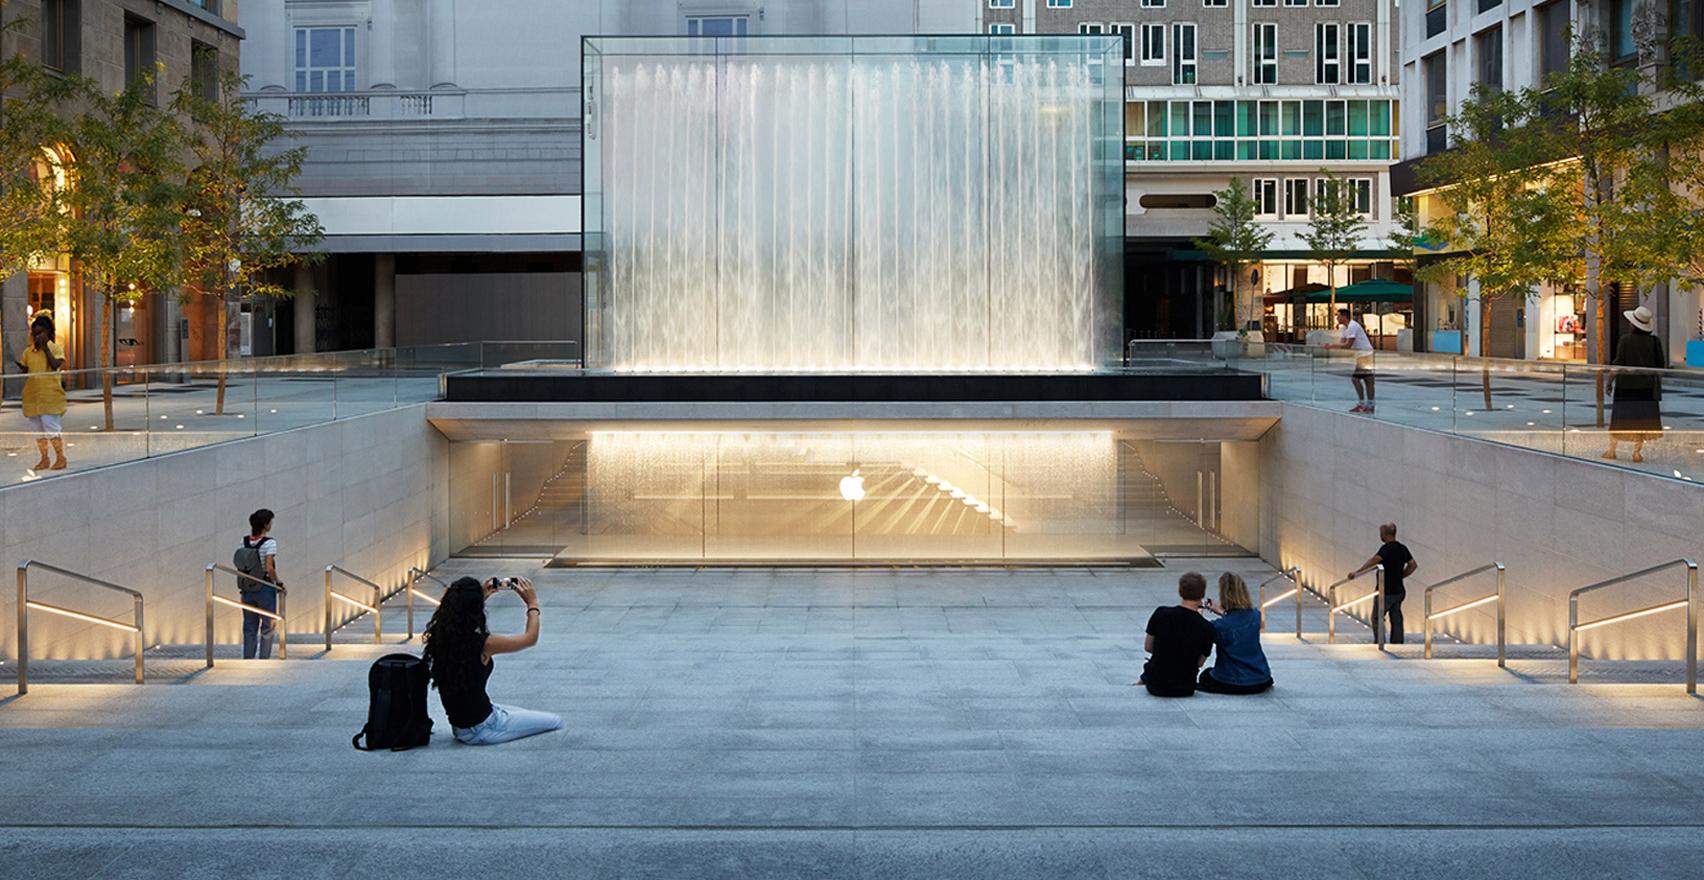 11 Breathtaking Apple Stores Around the World - Galerie